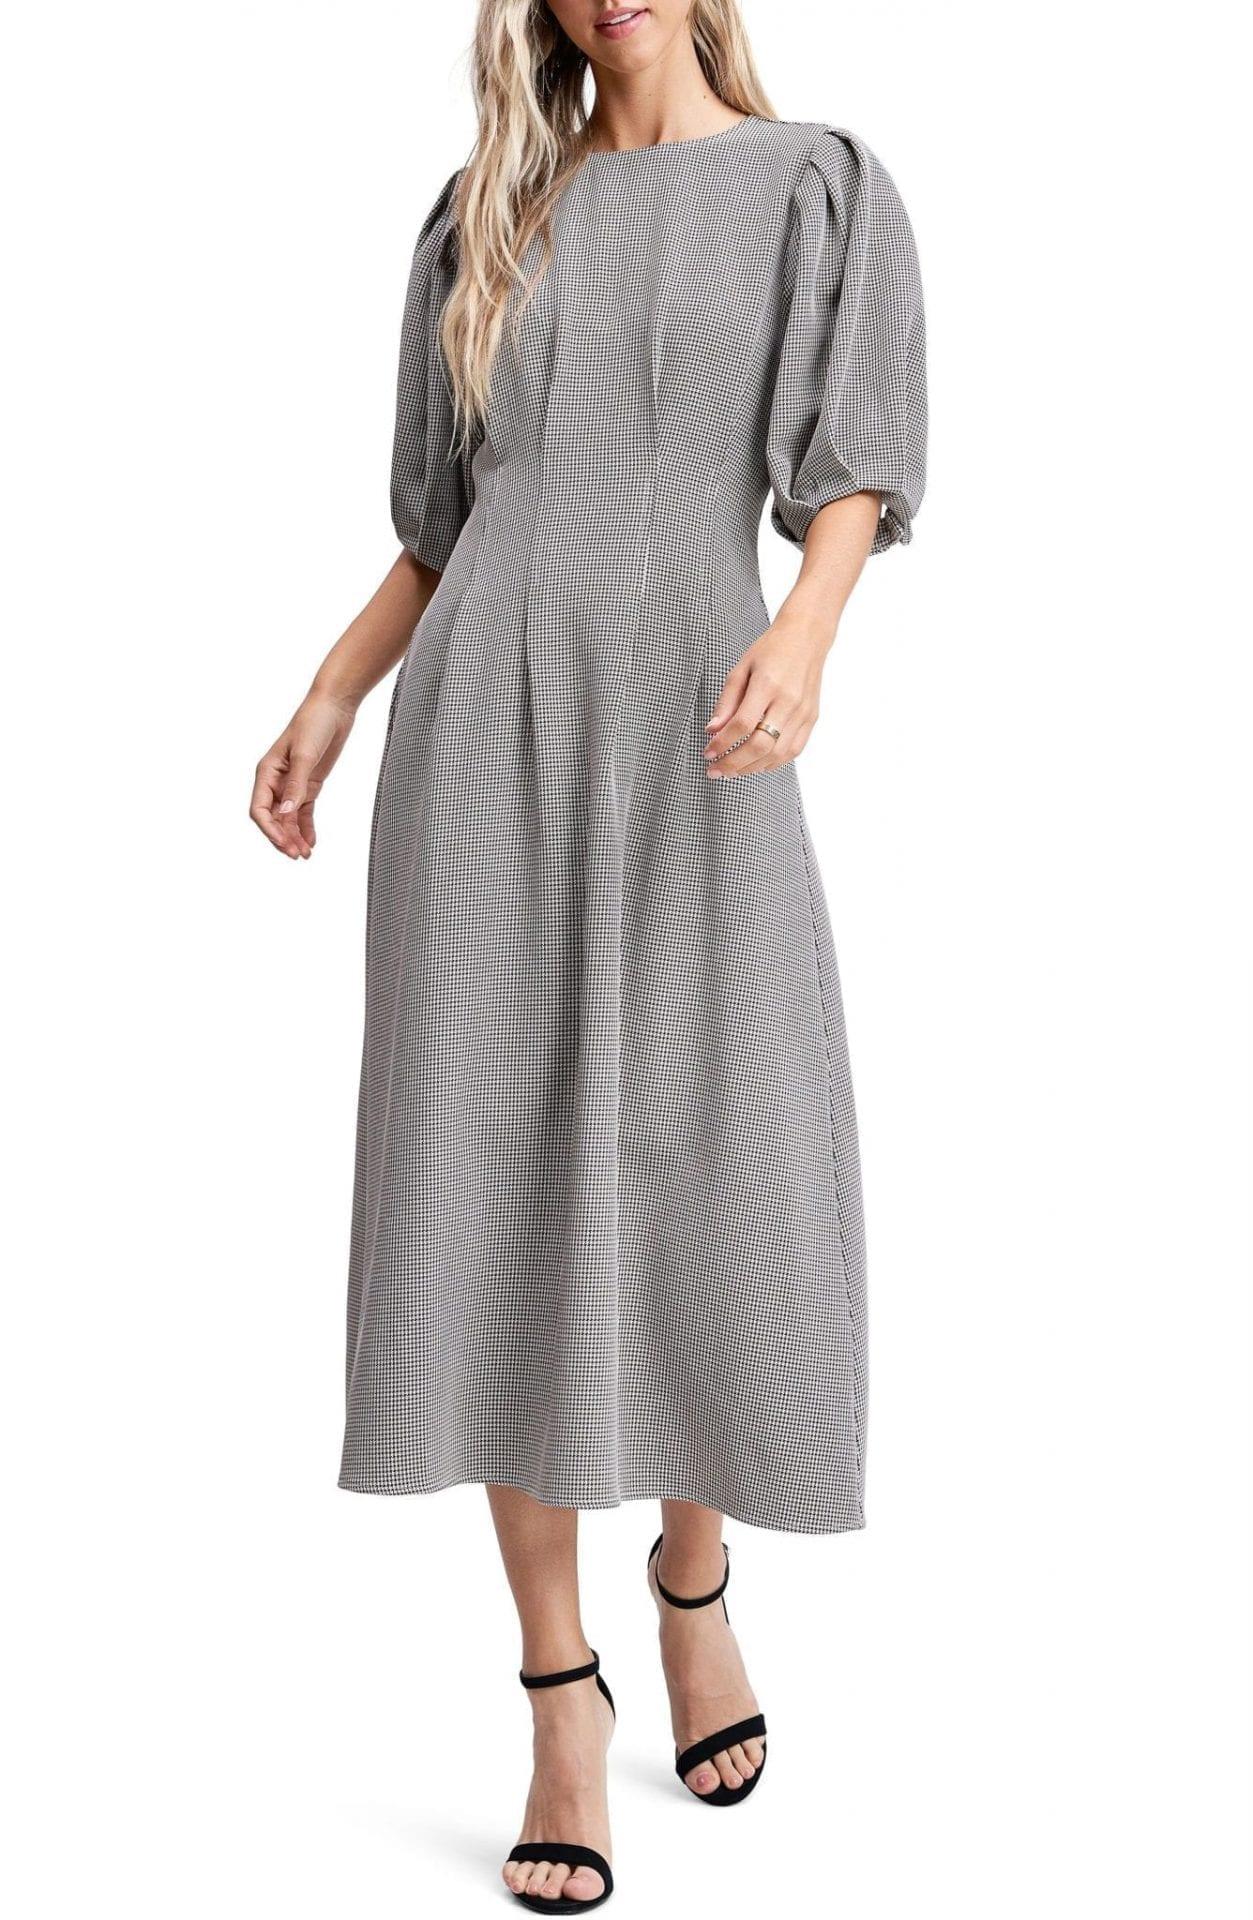 EN SAISON Puff Sleeve Midi Dress